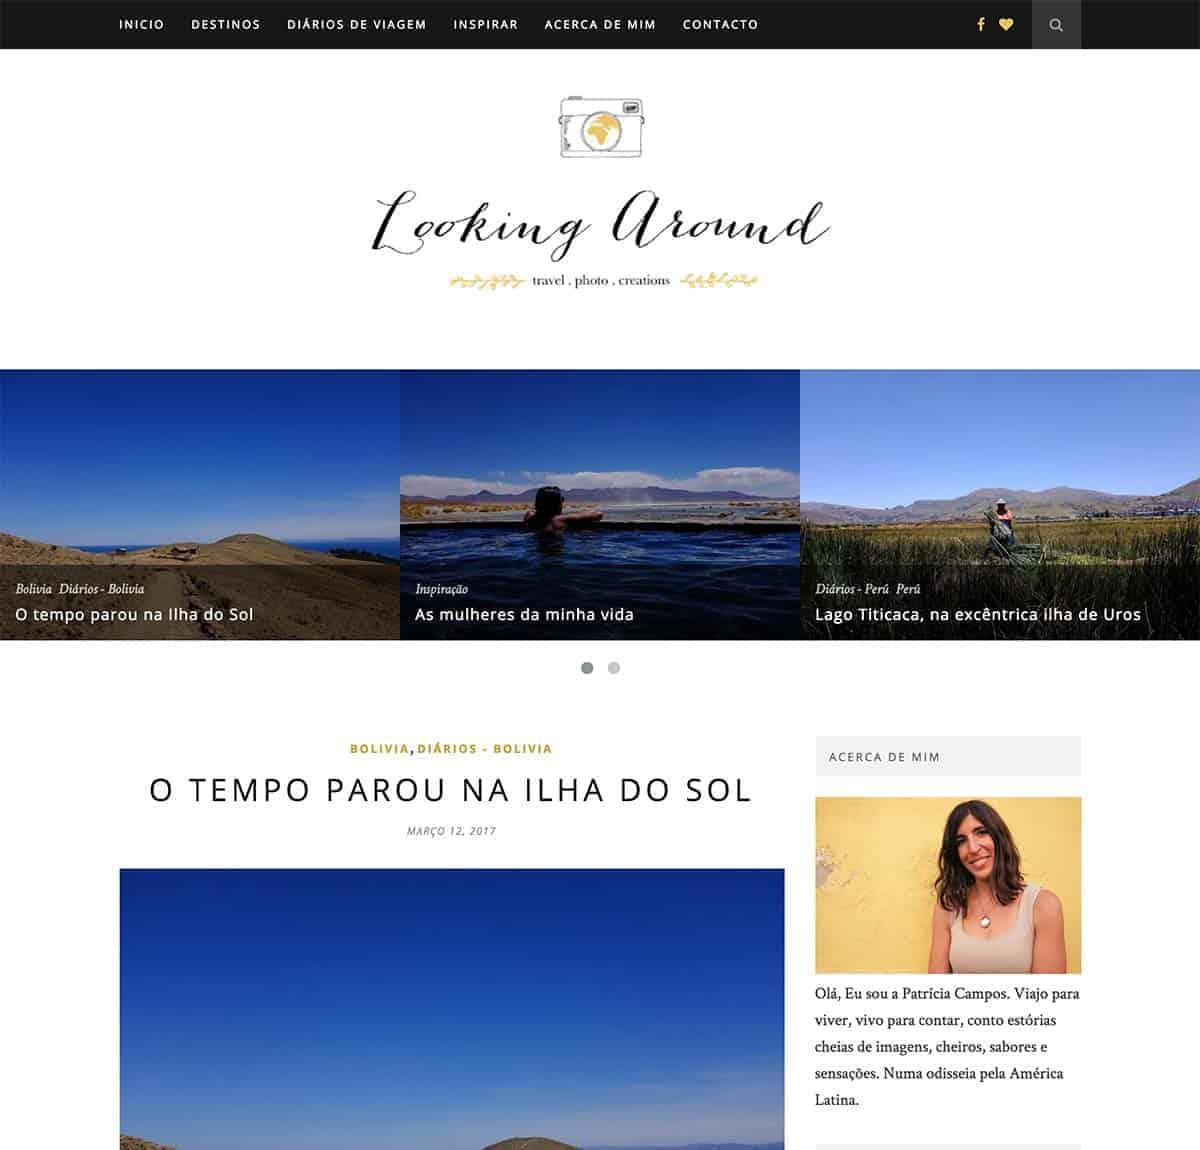 Blog: Looking Around me